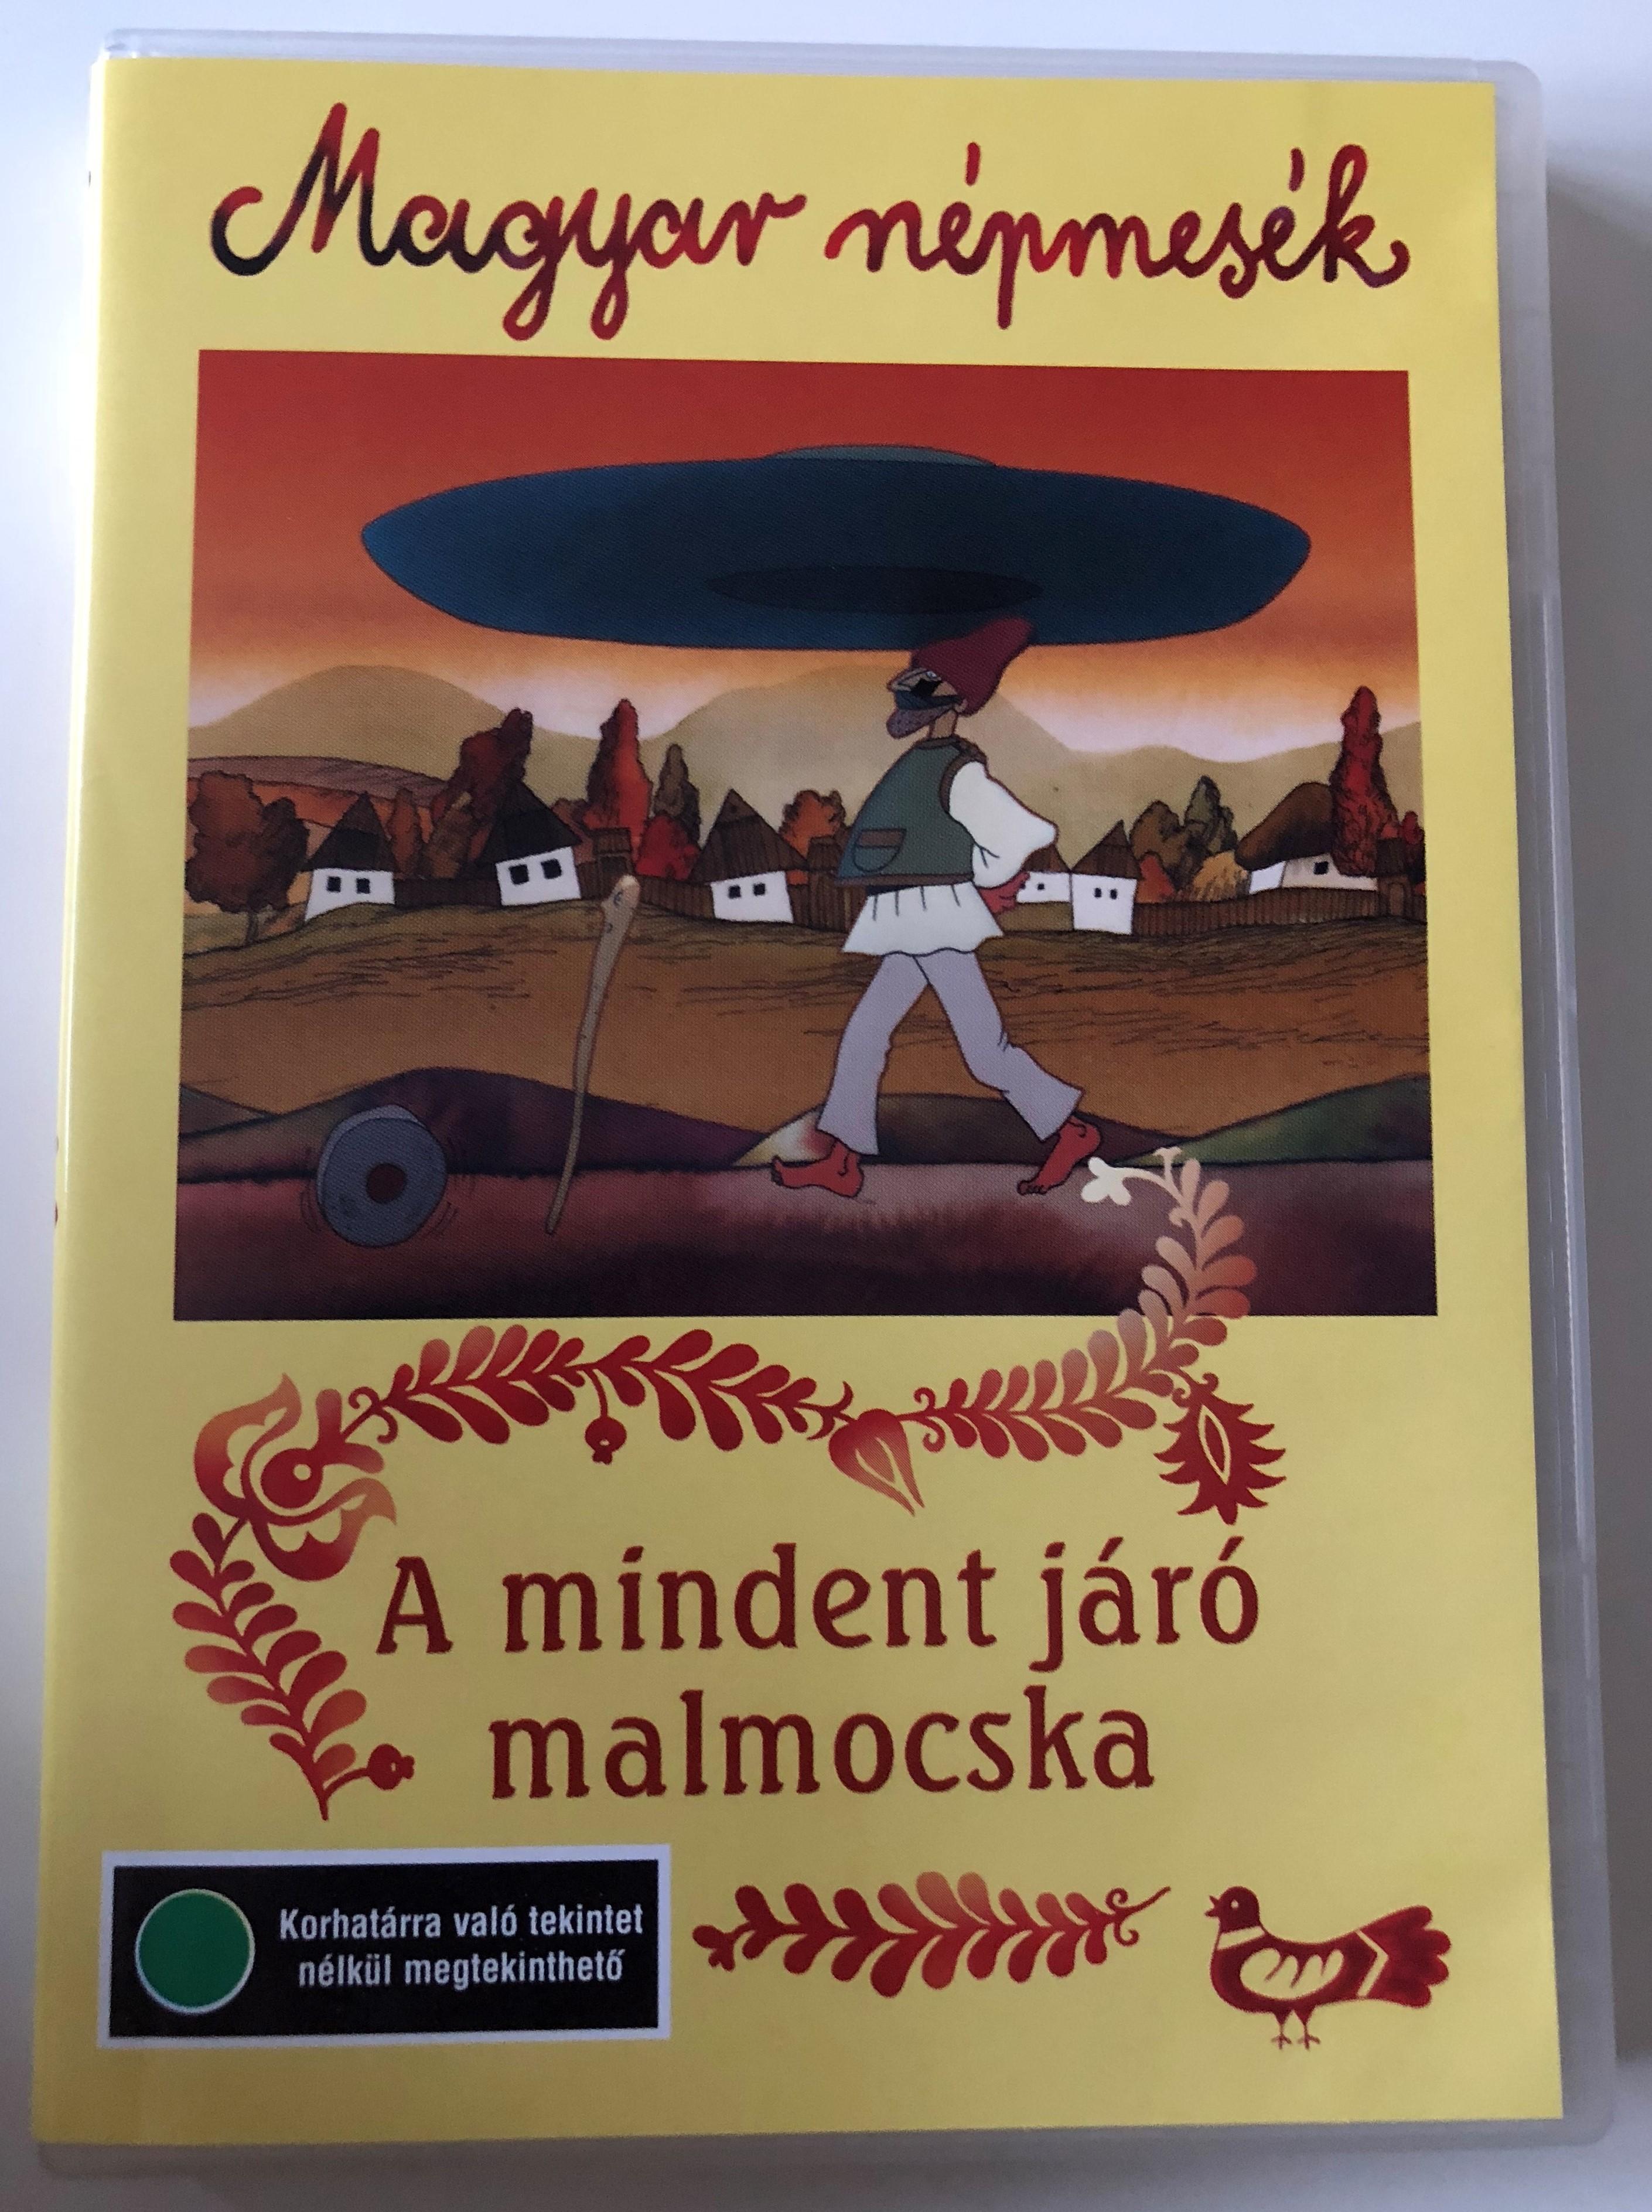 a-mindent-j-r-malmocska-dvd-2005-directed-by-jankovics-marcell-starring-szab-gyula-va-1-.jpg